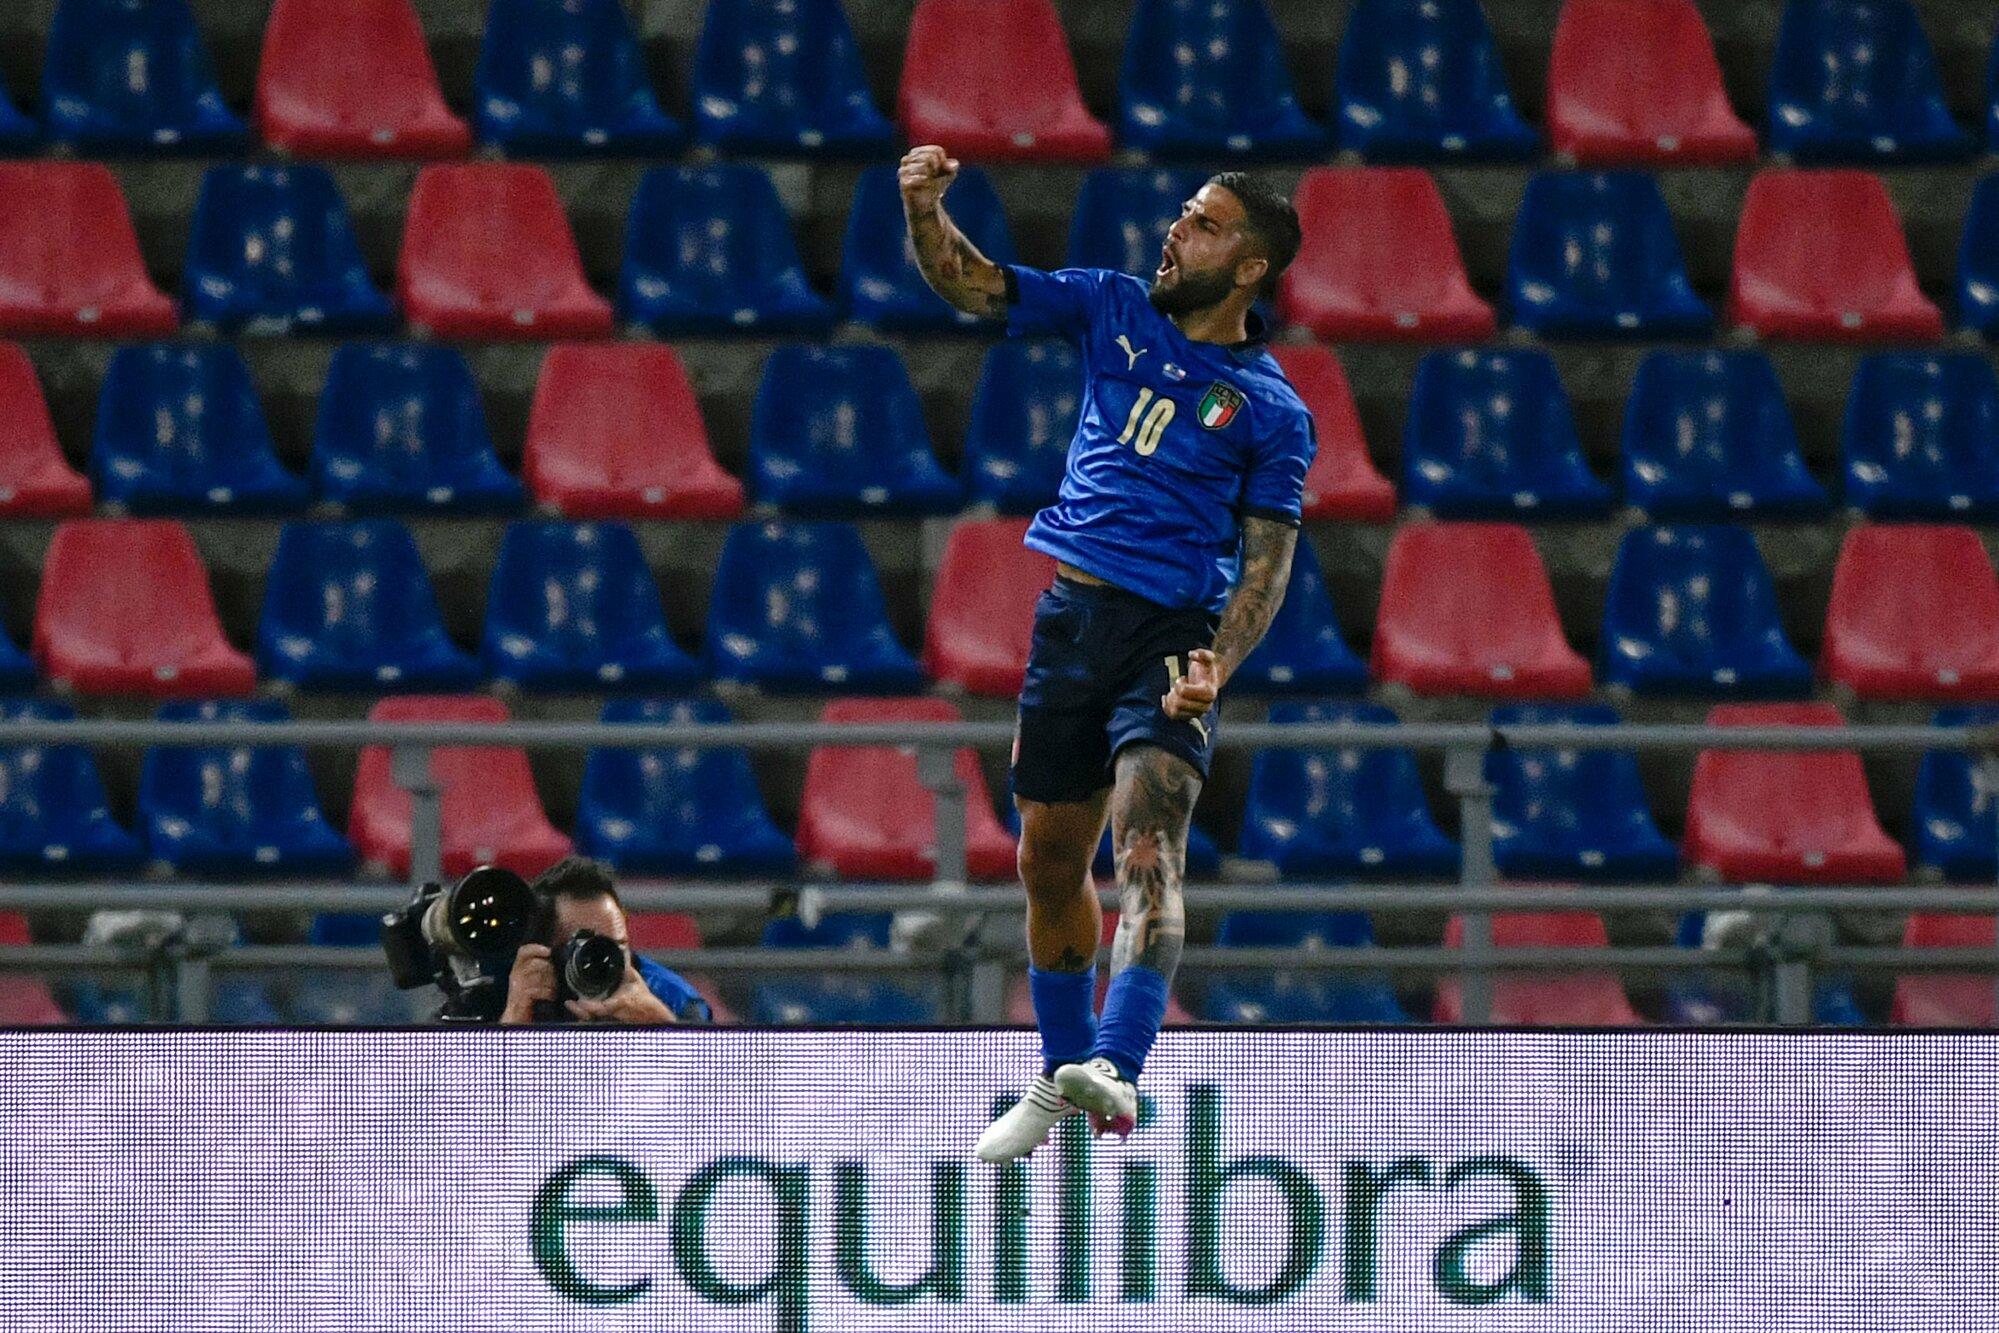 Italia terbang dengan 27 pertandingan beruntun tak terkalahkan di bawah Mancini.  Foto: FIGC